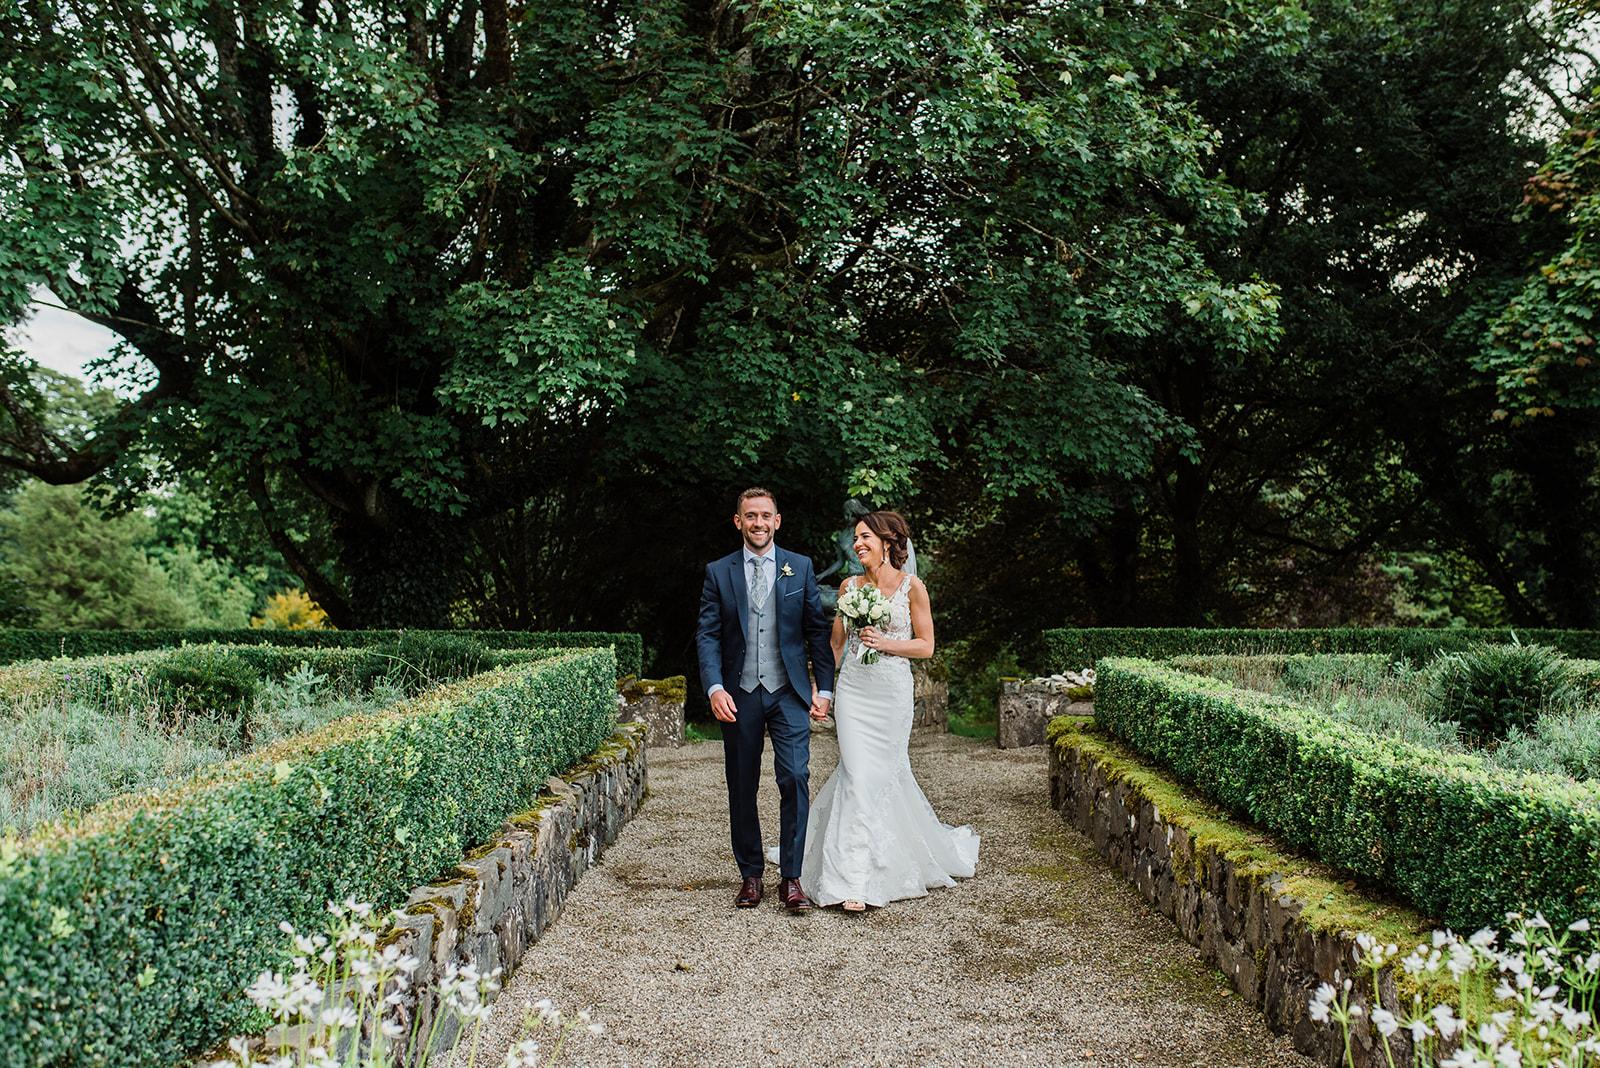 Bride and groom walking in the Partere garden in Virginia park lodge